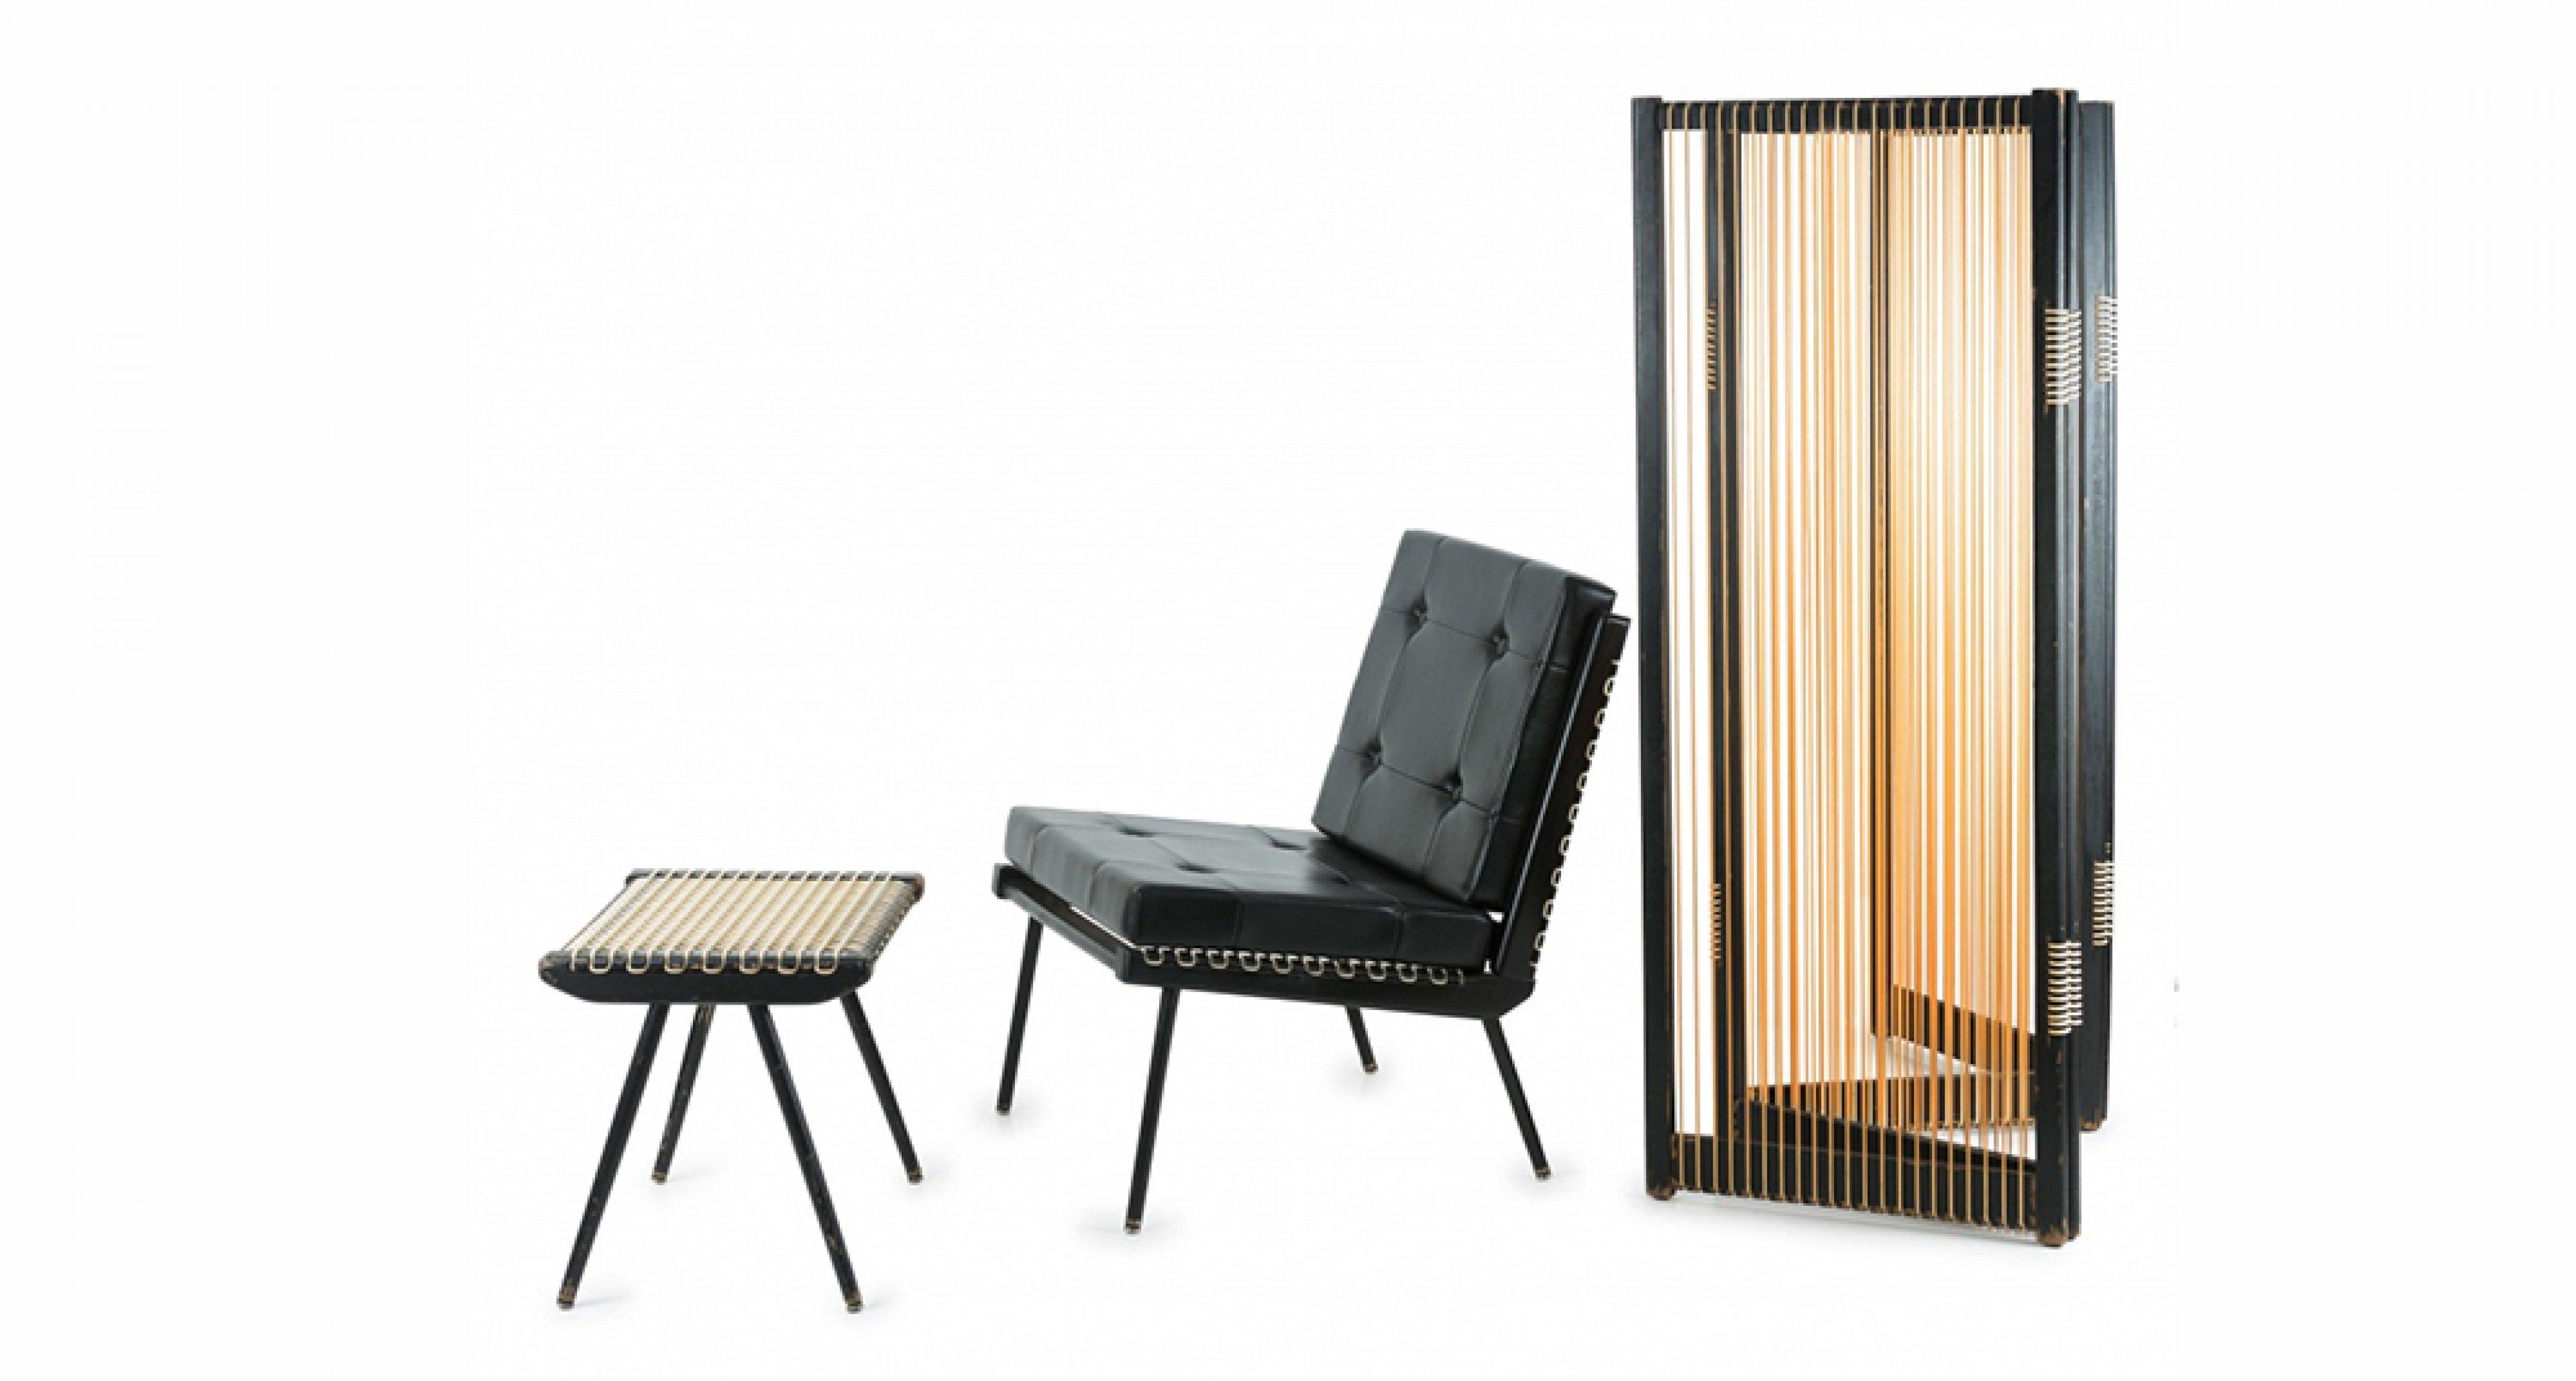 Aktenschrank design  From Copenhagen to Murano – Quittenbaum to offer international ...